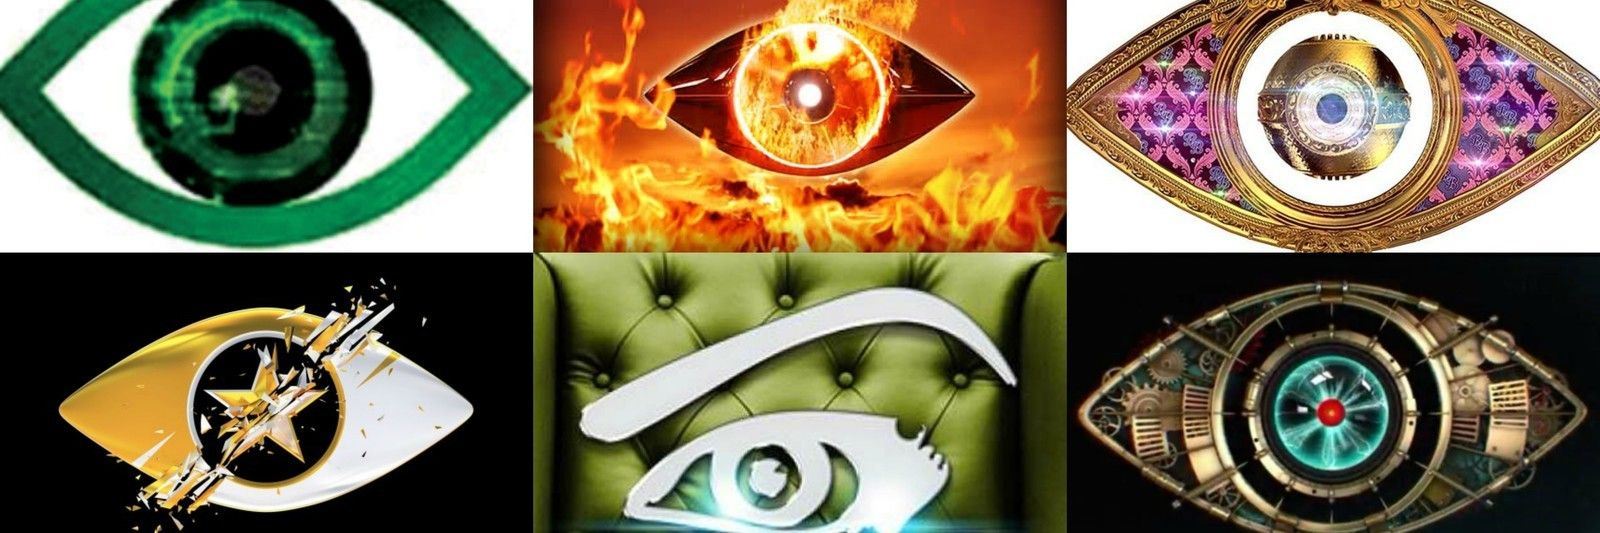 27 biggie eye 004 pre